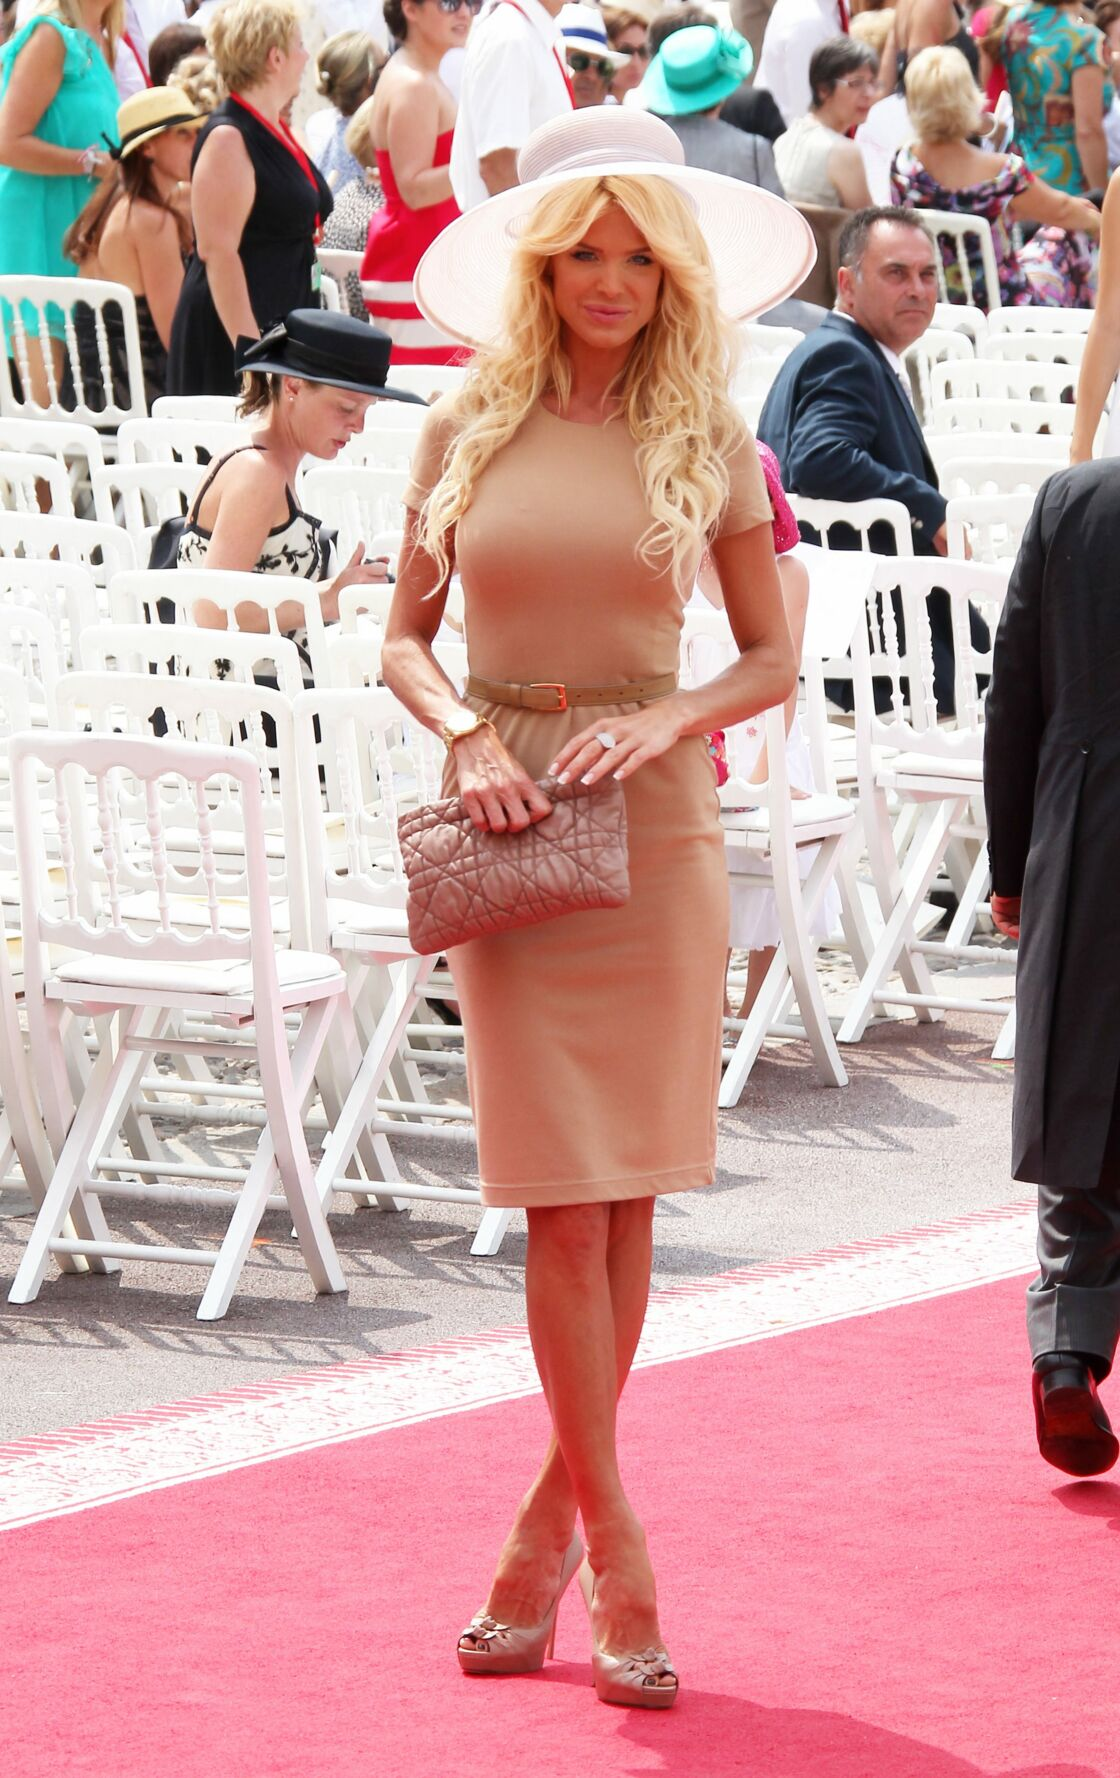 Victoria Silvstedt au mariage de Charlene et Albert de Monaco en 2011